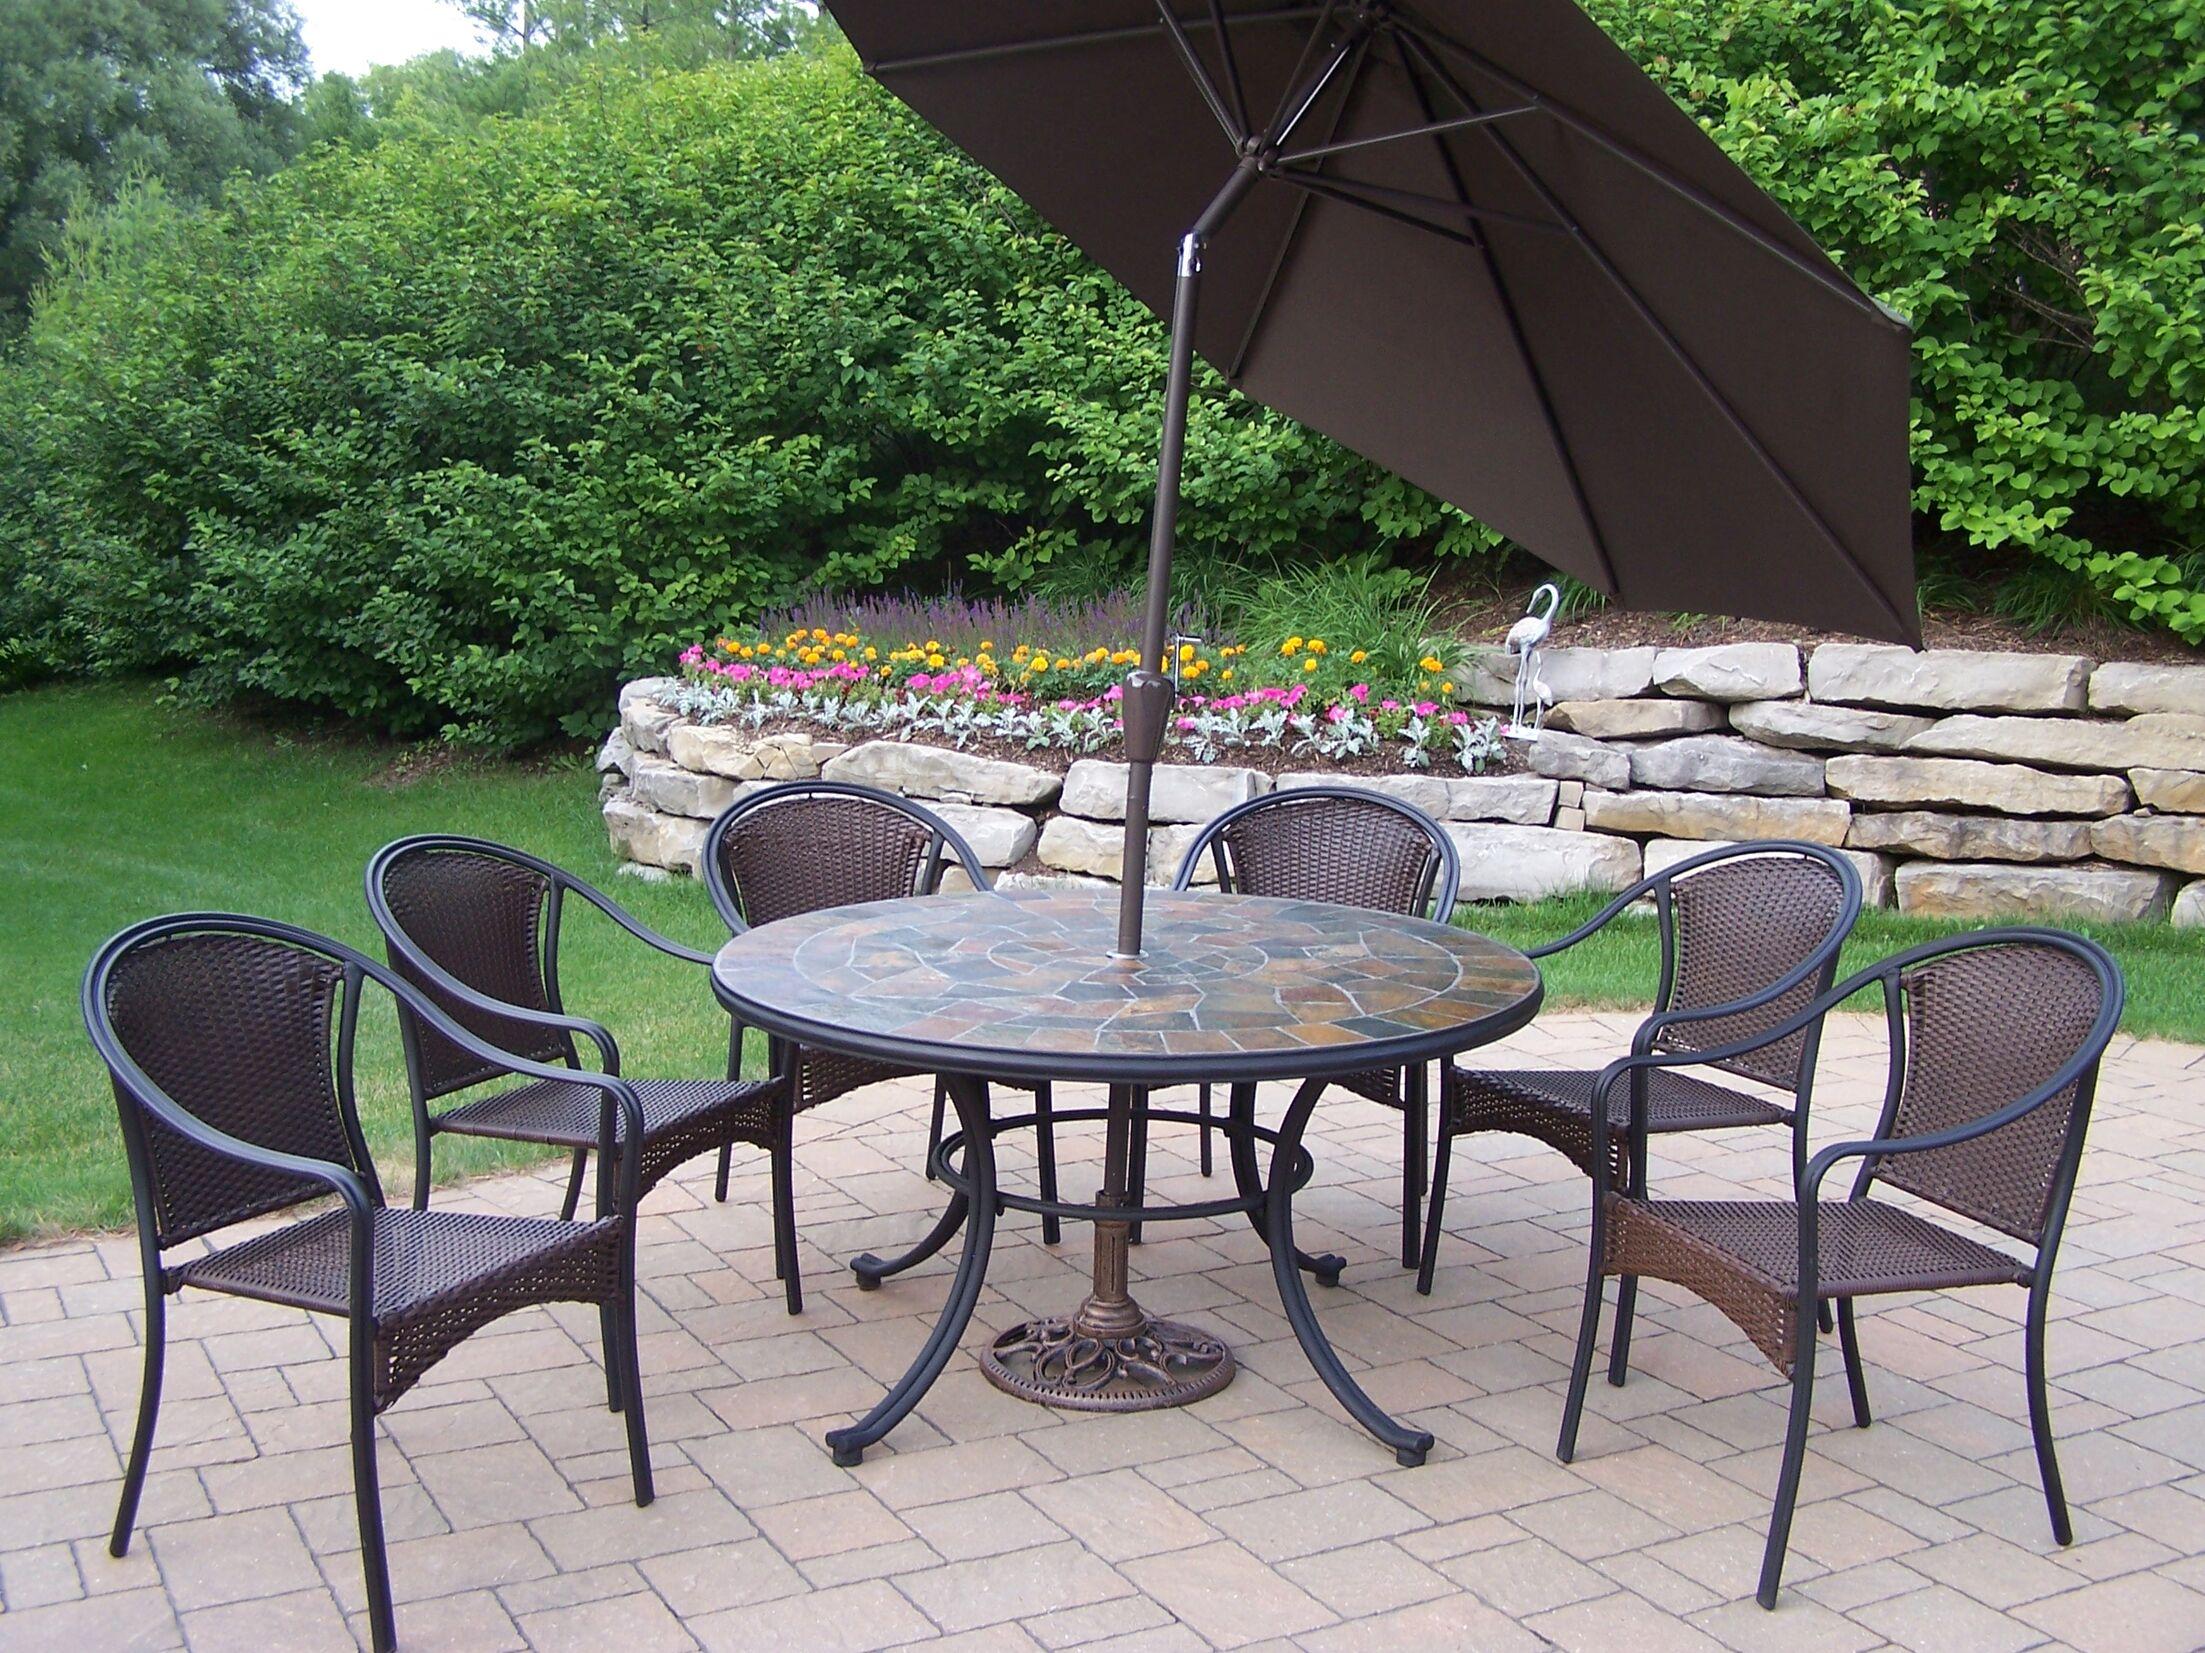 Tuscany Stone Art Dining Set with Umbrella Umbrella Color: Brown